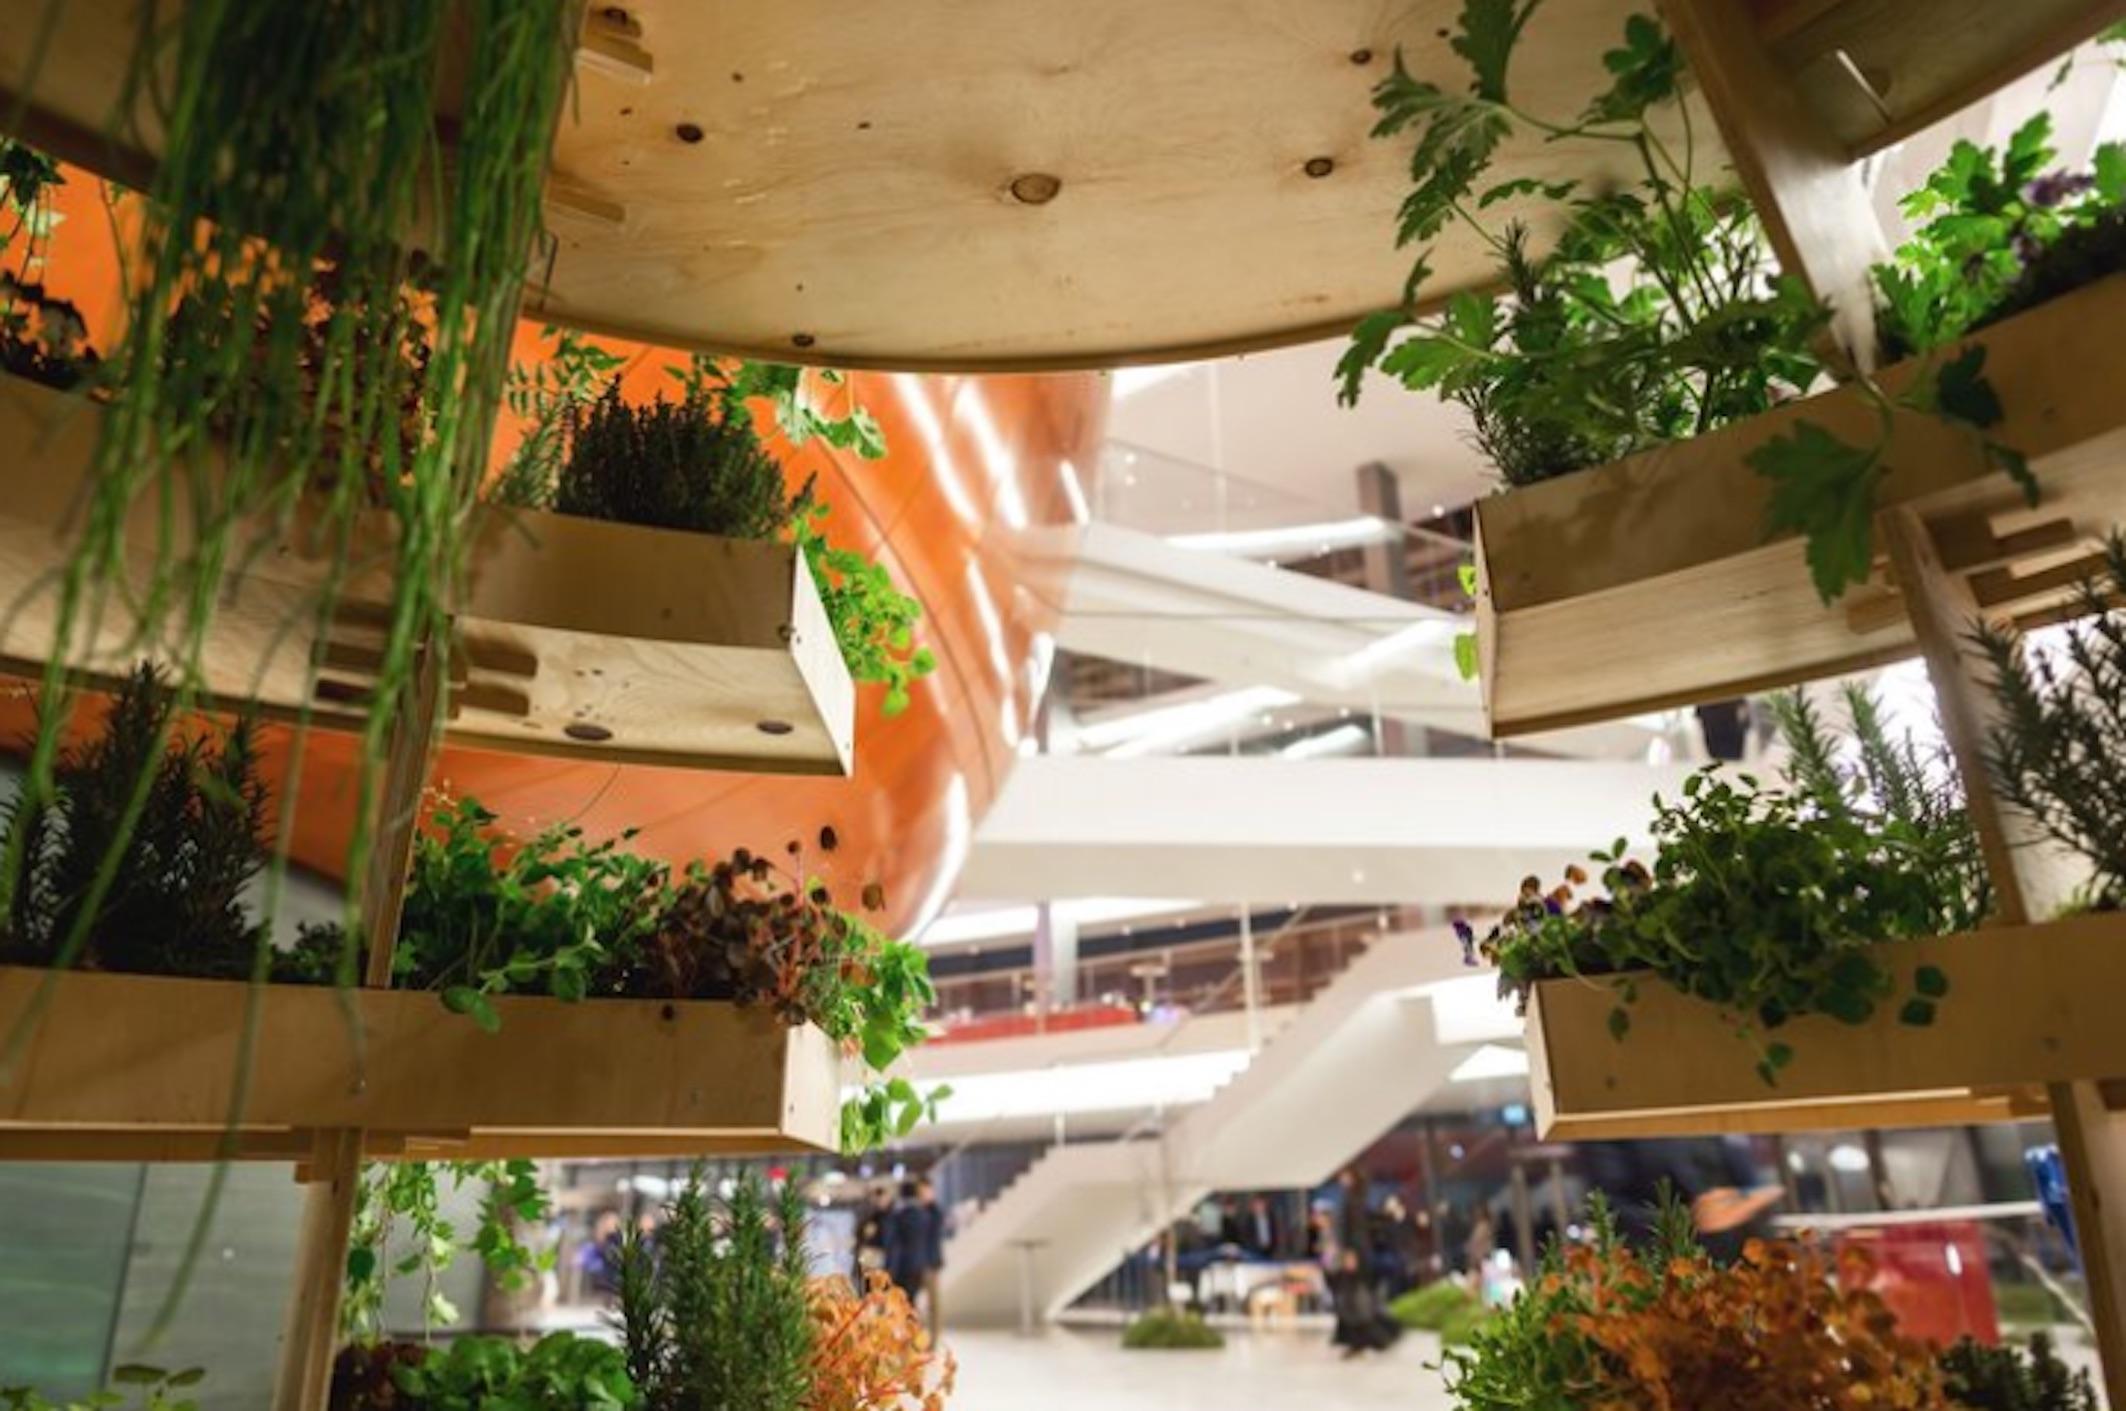 Ikea garden sphere free plans for a sustainable garden for Sphere garden design